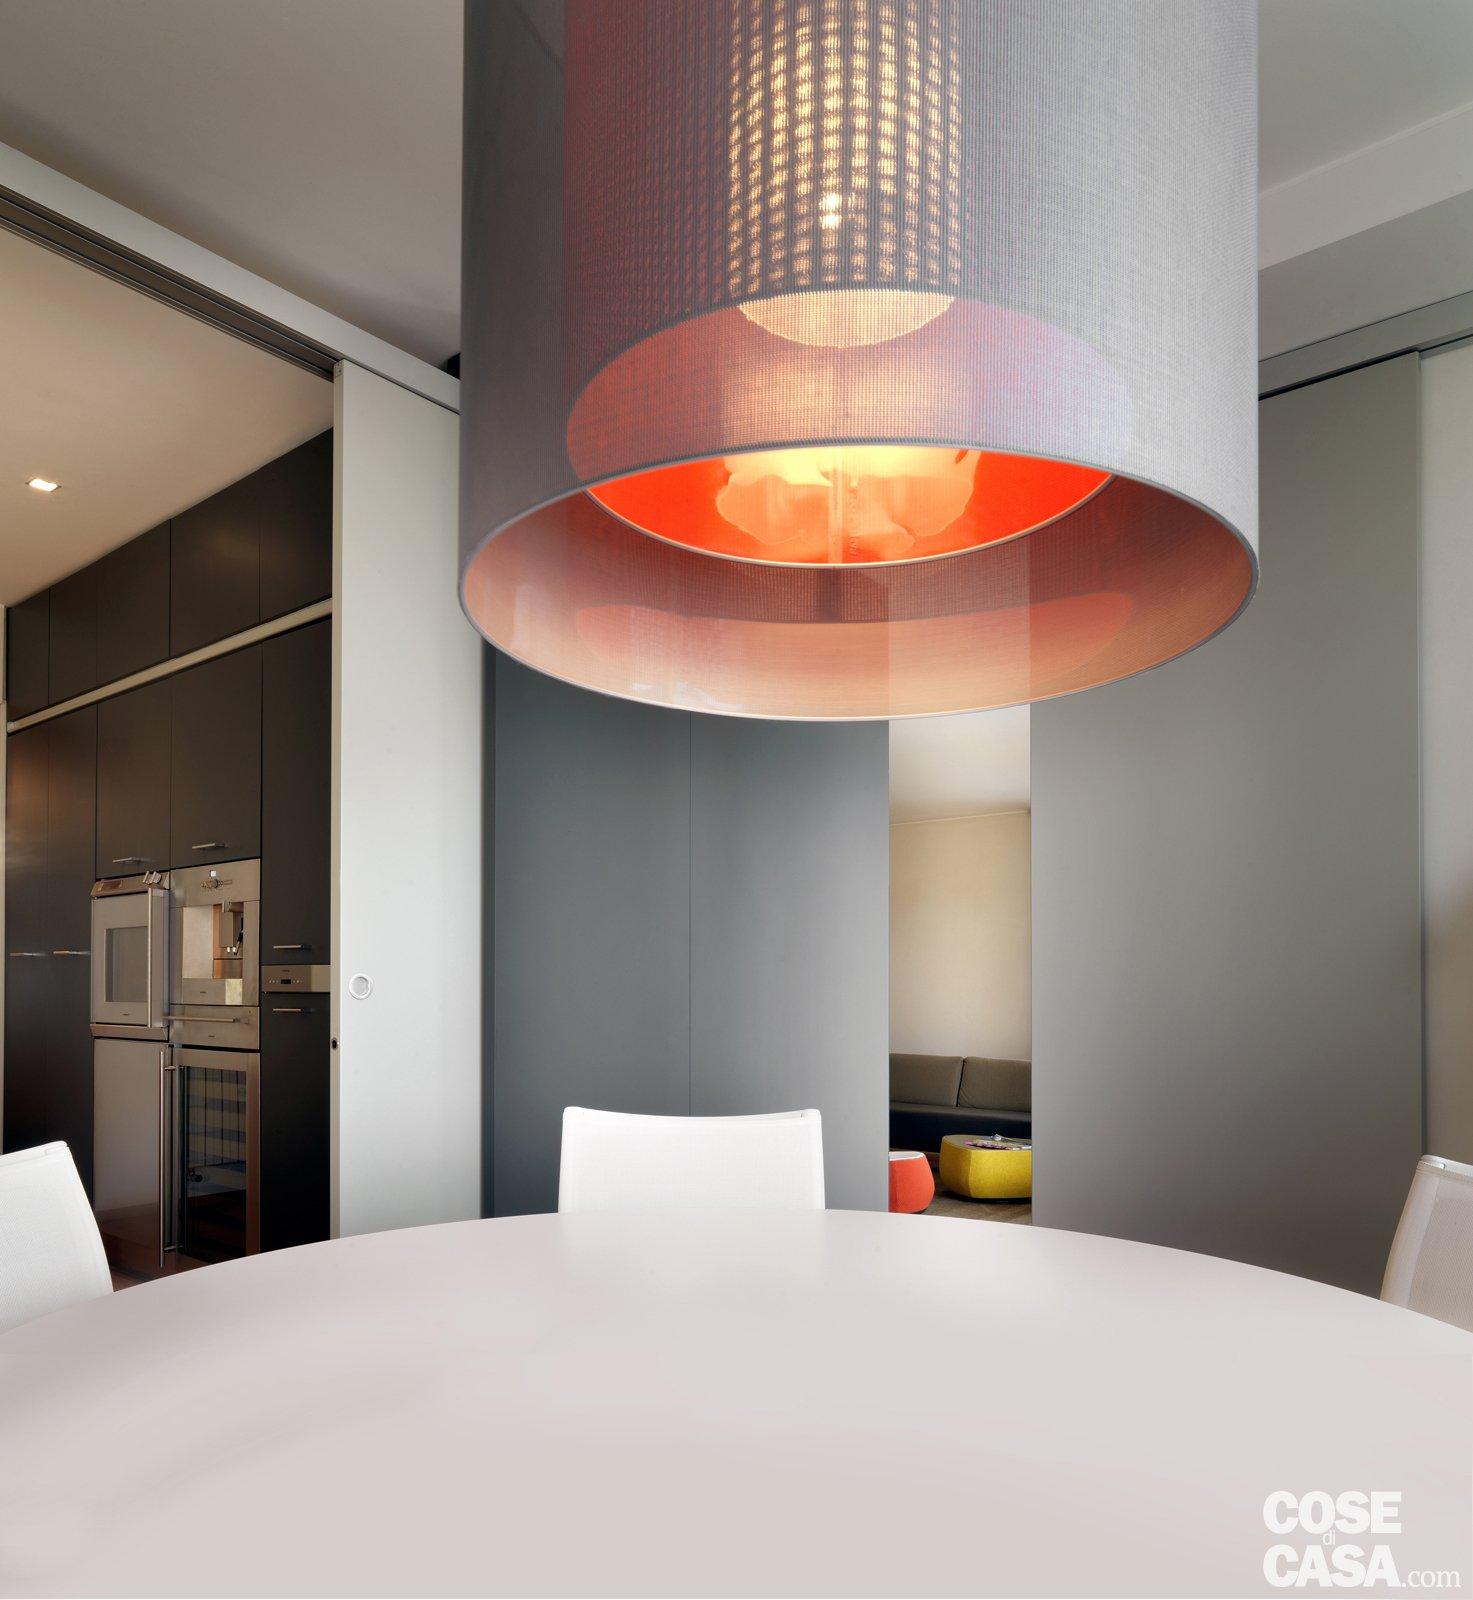 Una Casa Arredata Con Pezzi Di Design E Finiture Di Tendenza Cose Di  #C52906 1473 1600 Lampade Per Sala Da Pranzo